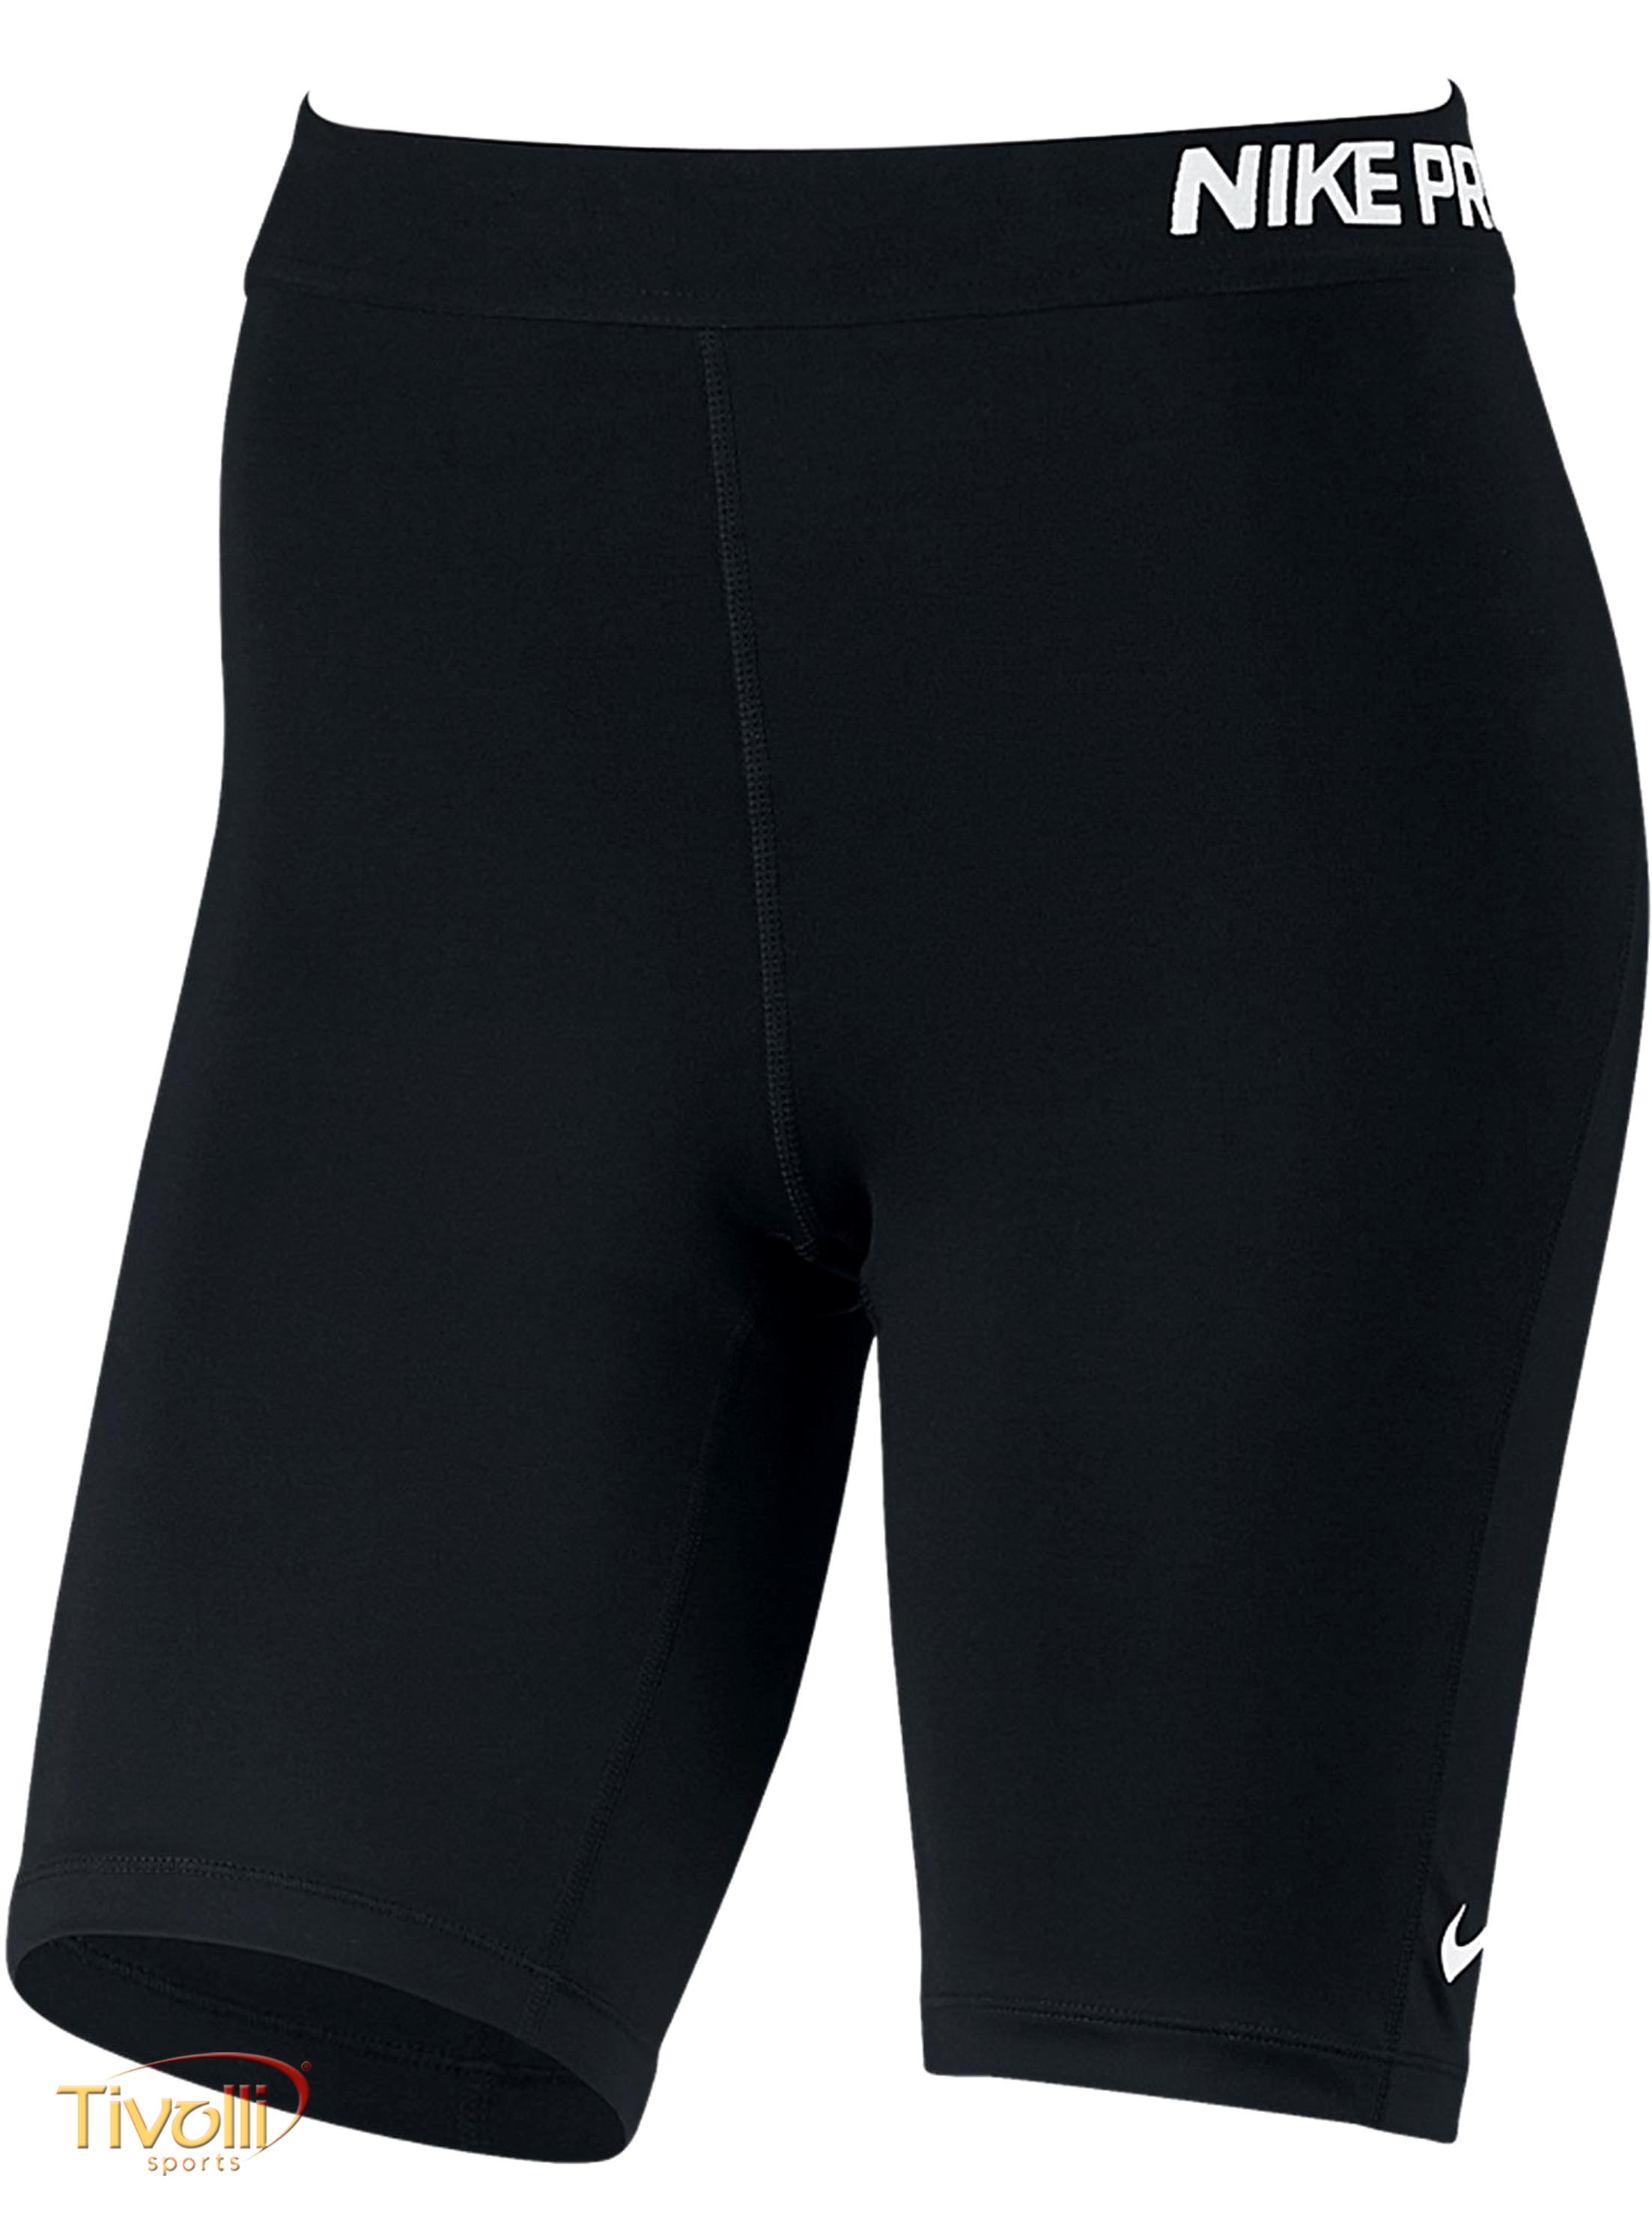 Shorts Nike Pro Cool Feminino 8 Polegadas